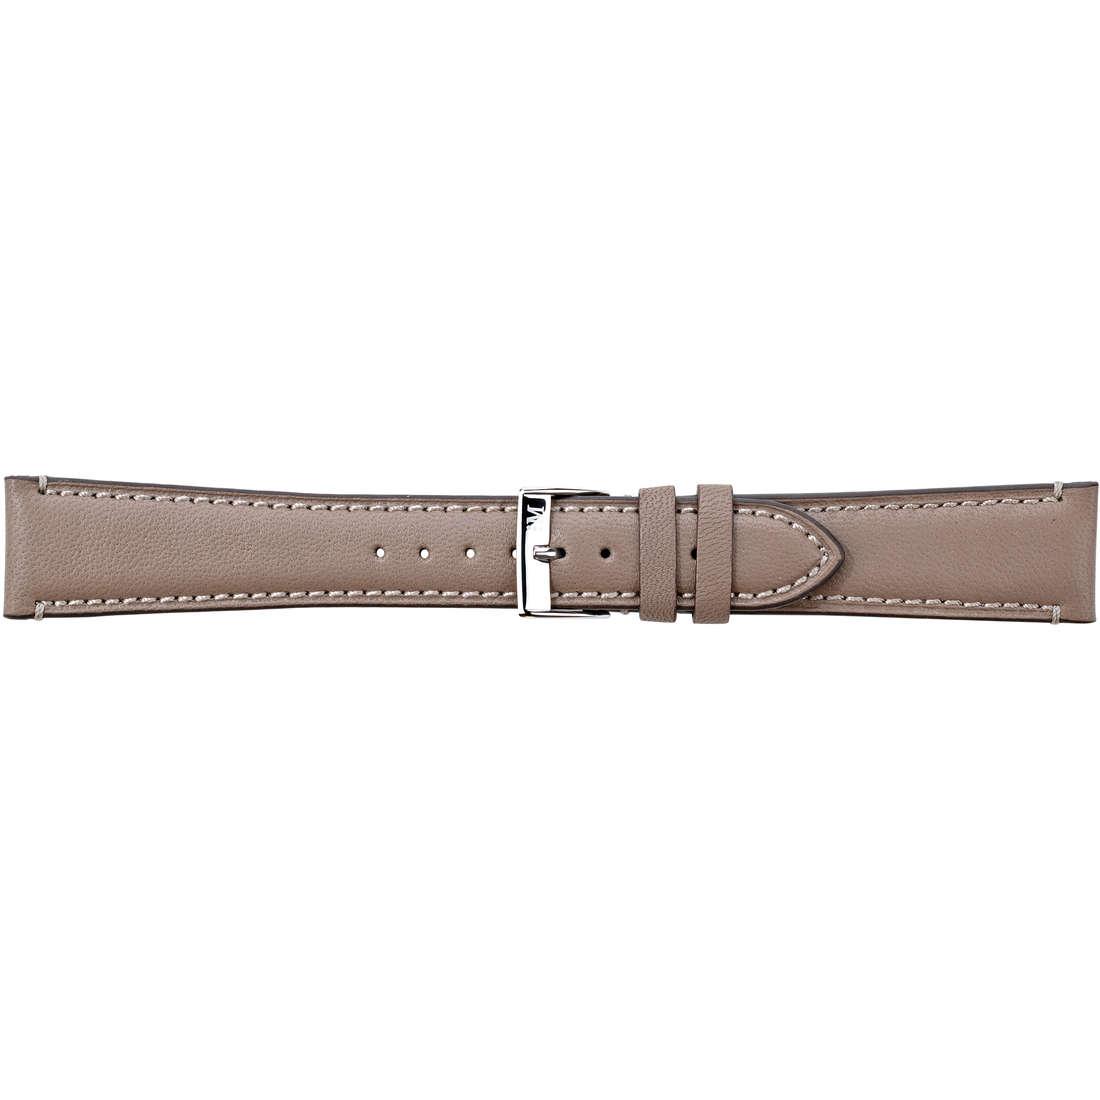 watch watch bands watch straps man Morellato Manufatti A01X3495006029CR18